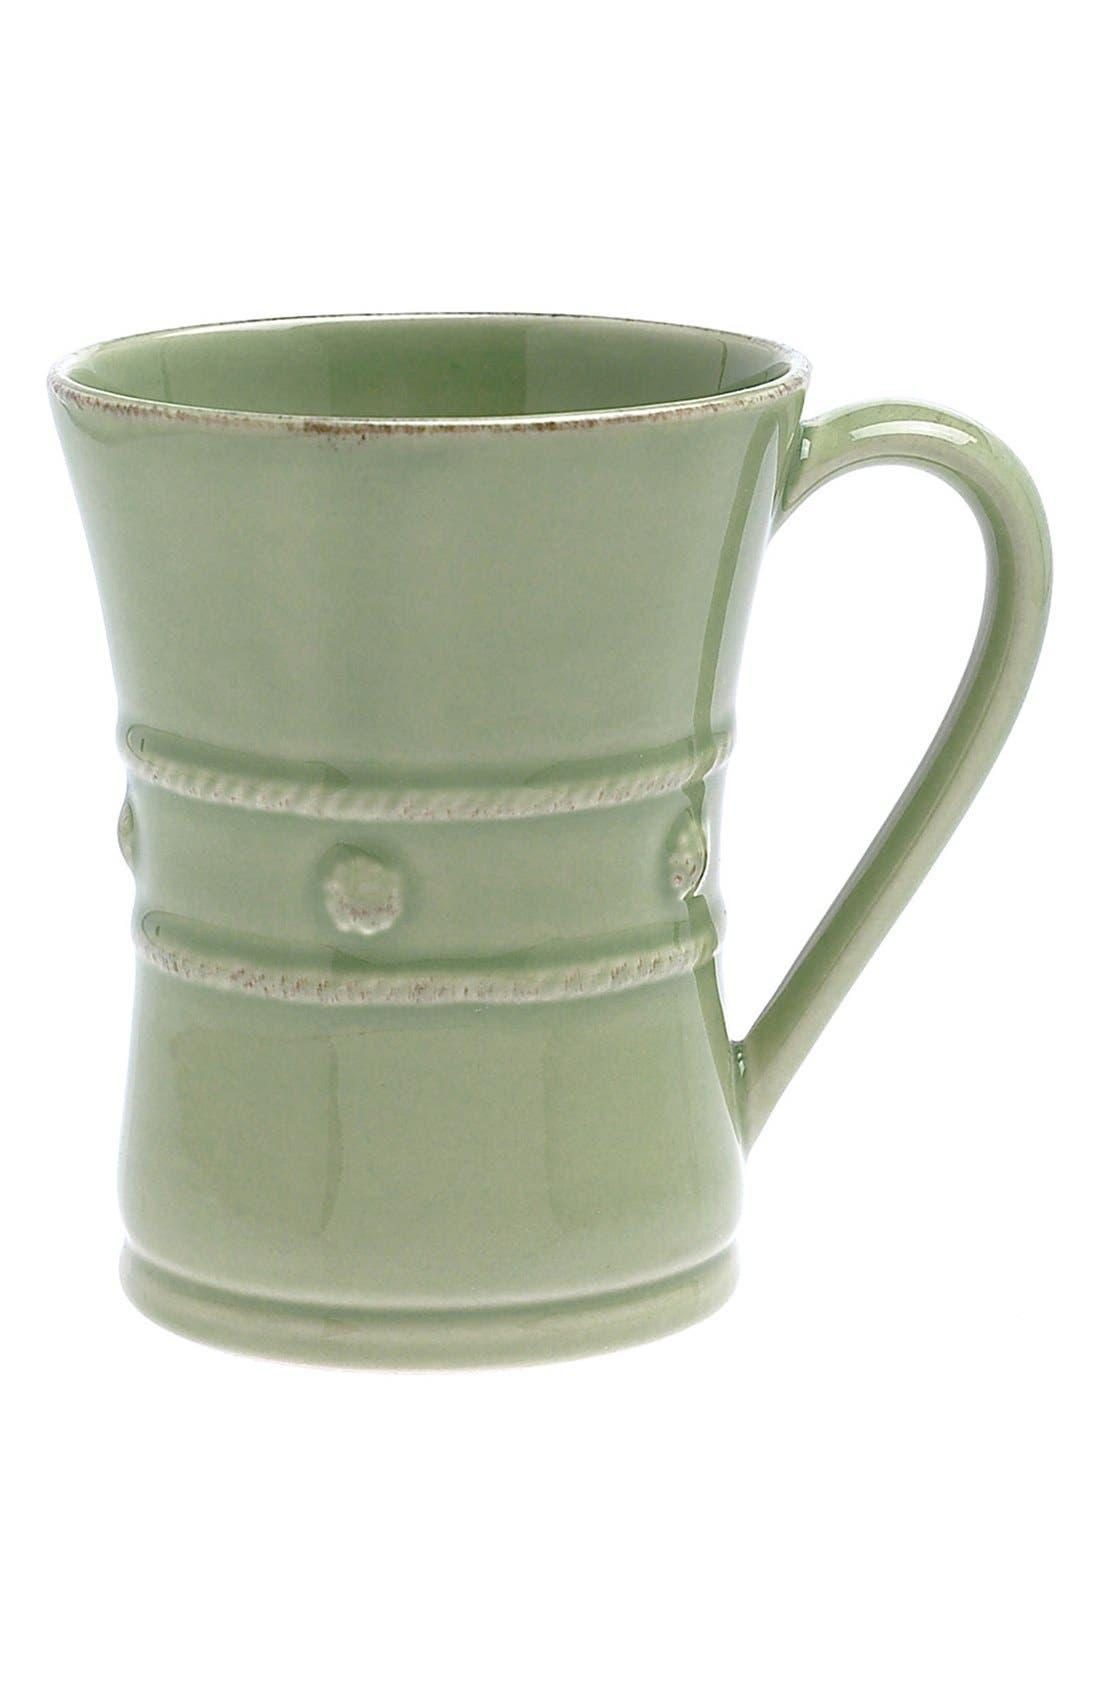 Main Image - Juliska 'Berry and Thread' Ceramic Coffee Mug